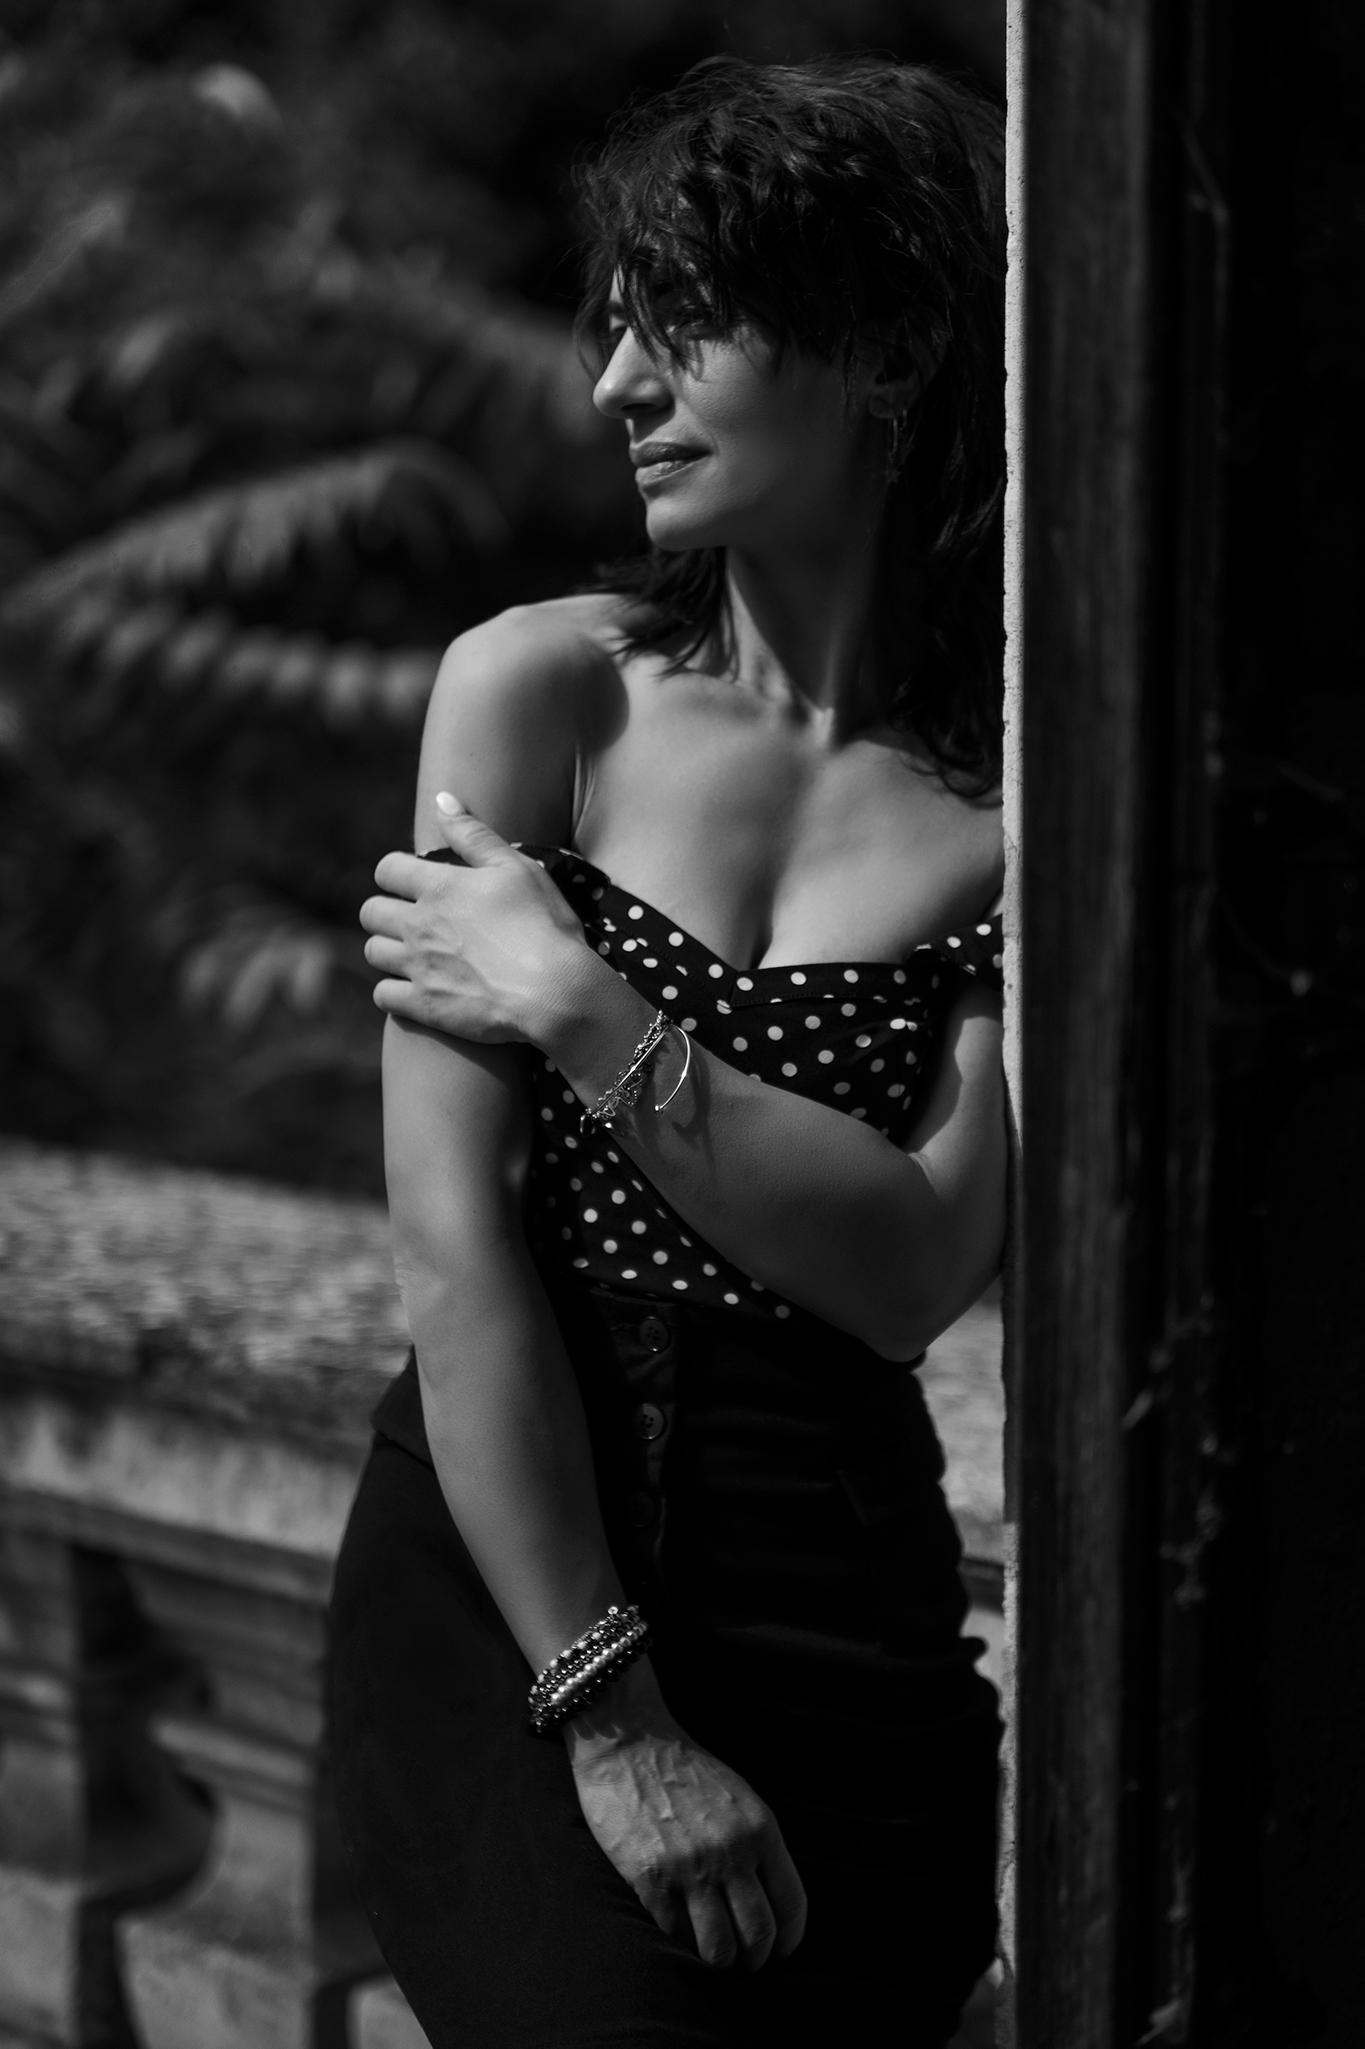 Categorie: Fashion, Glamour, Portrait; Photographer: FEDERICO PASQUALINI; Model: RAMONA MILANI; Location: Verona, VR, Italia